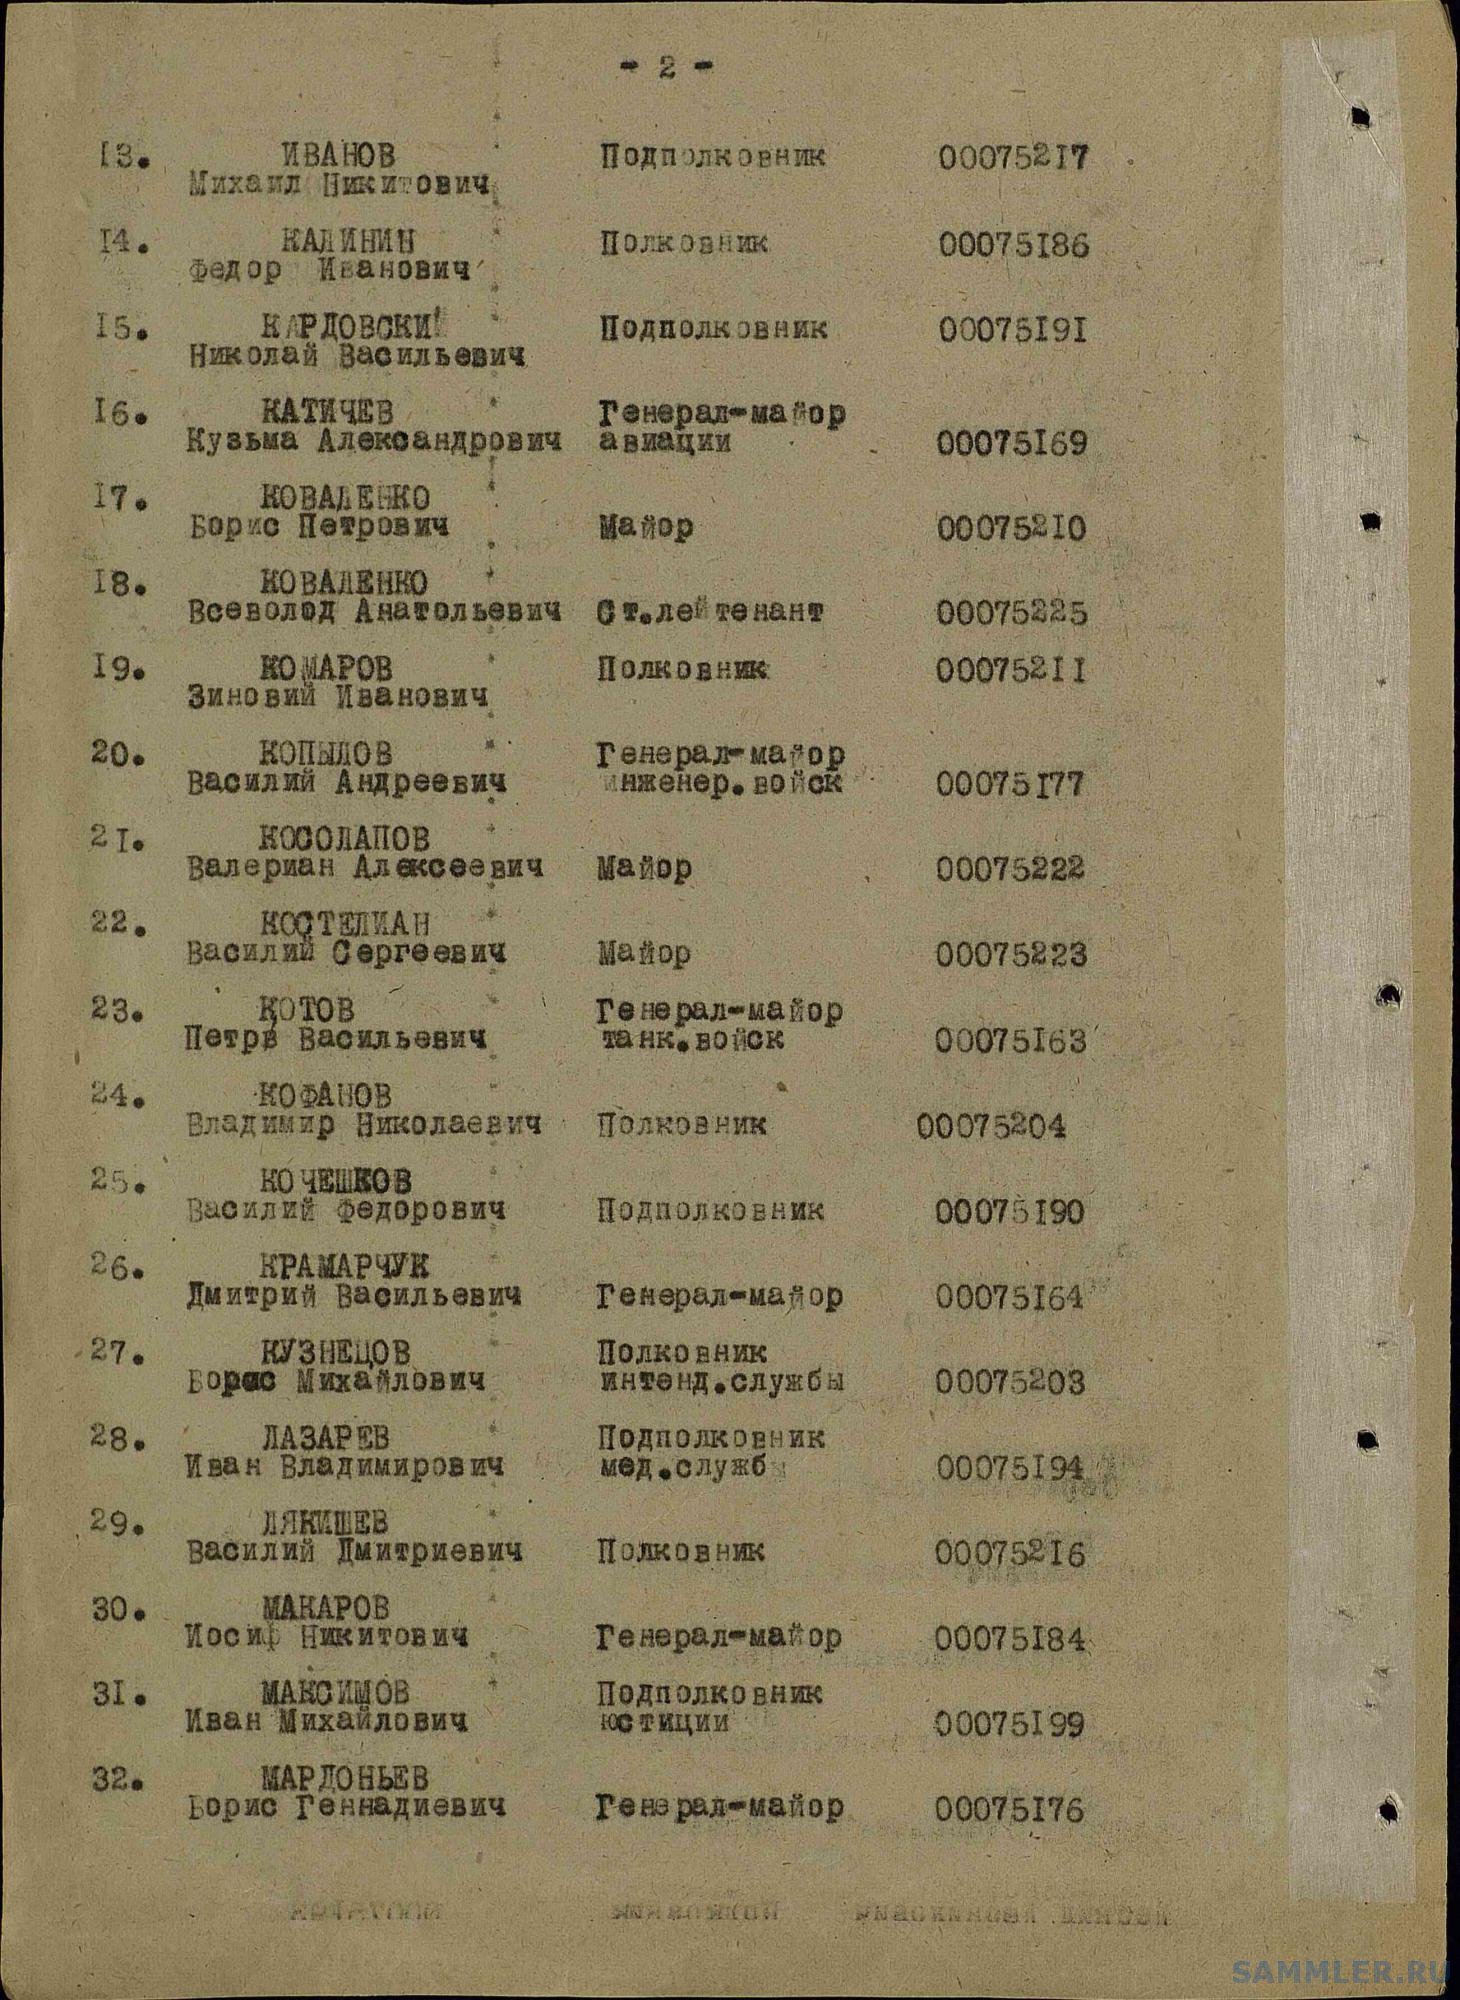 Мардоньев Борис Геннадьевич - медаль За победу 1945 - 2.jpg